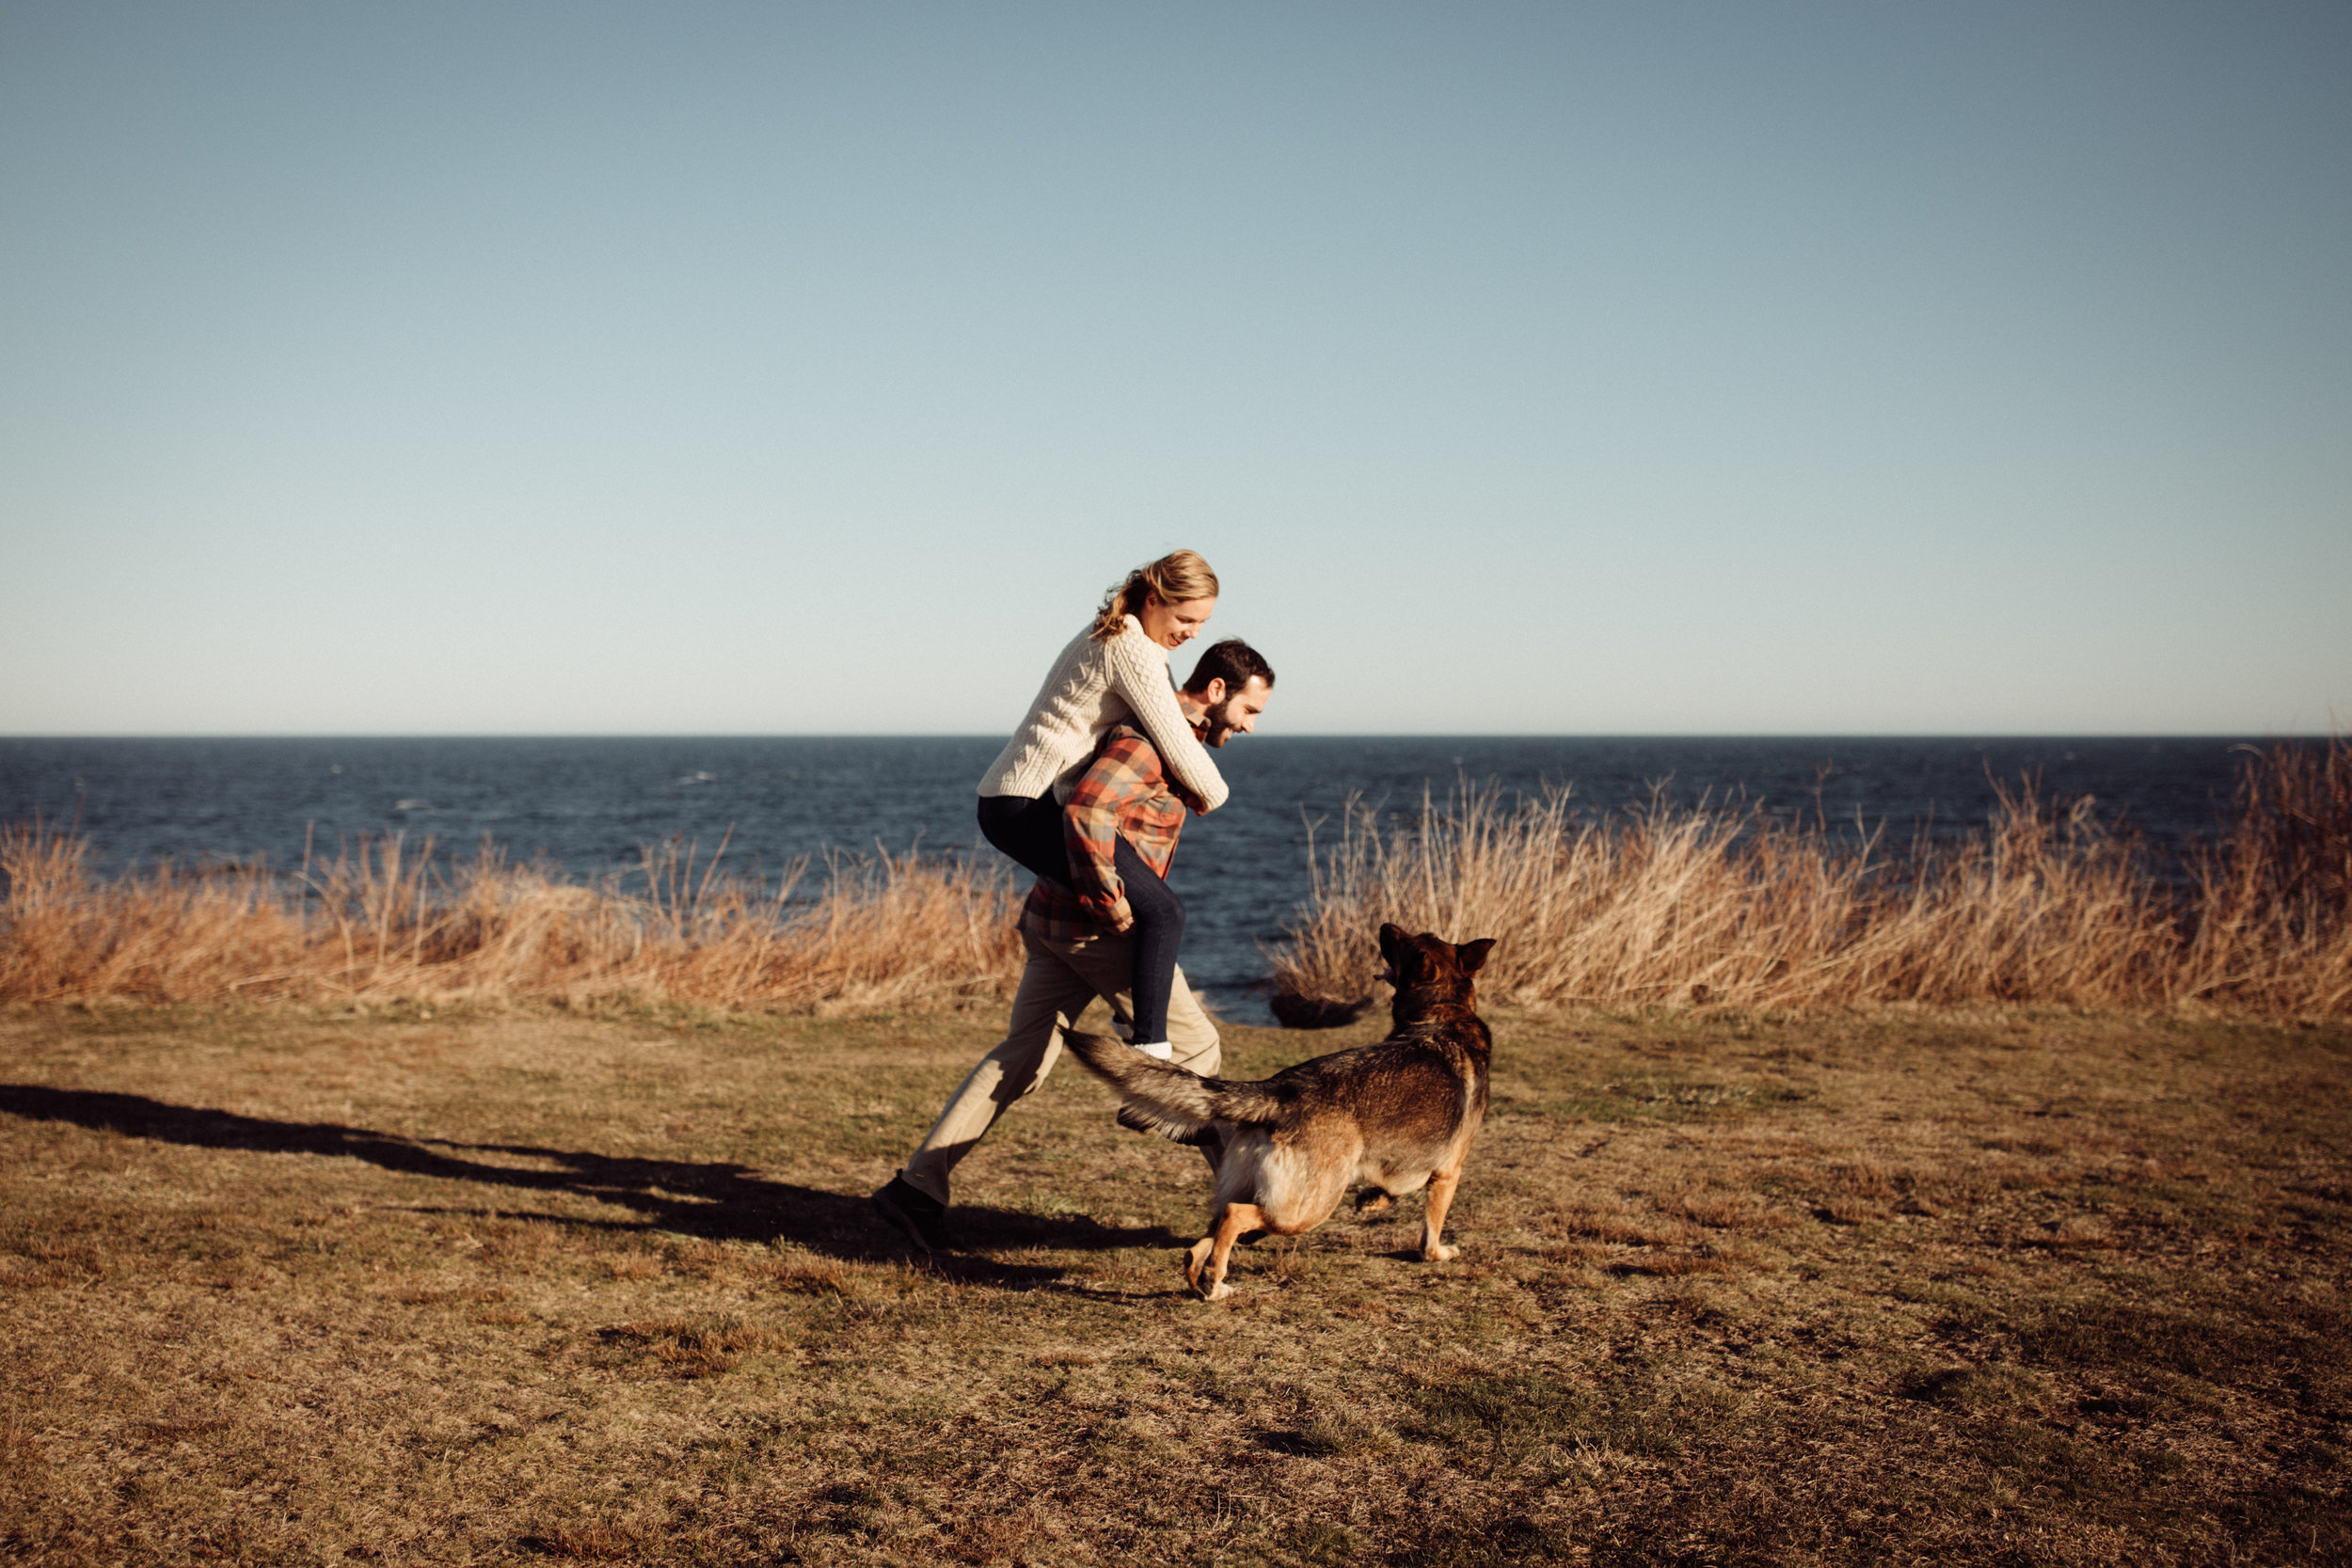 tonya-merke-photography-adventure-rhode-island-2.jpg